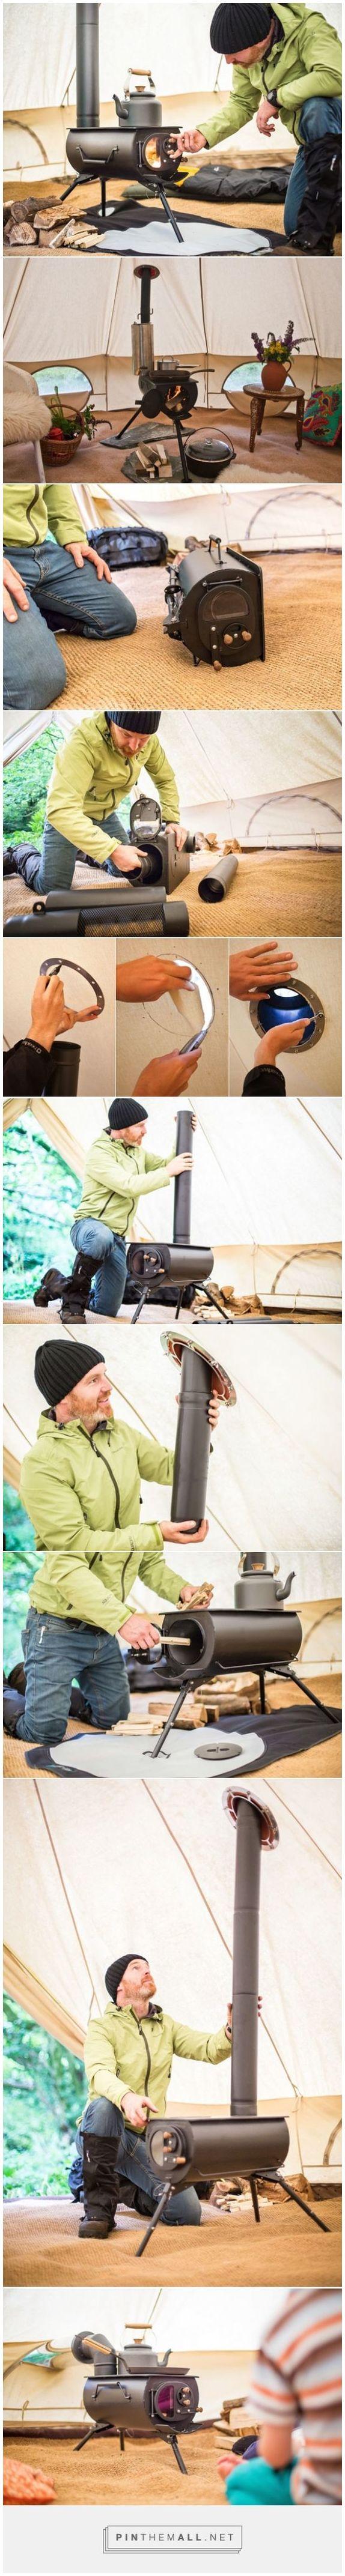 Best 25 Coleman camping ideas on Pinterest